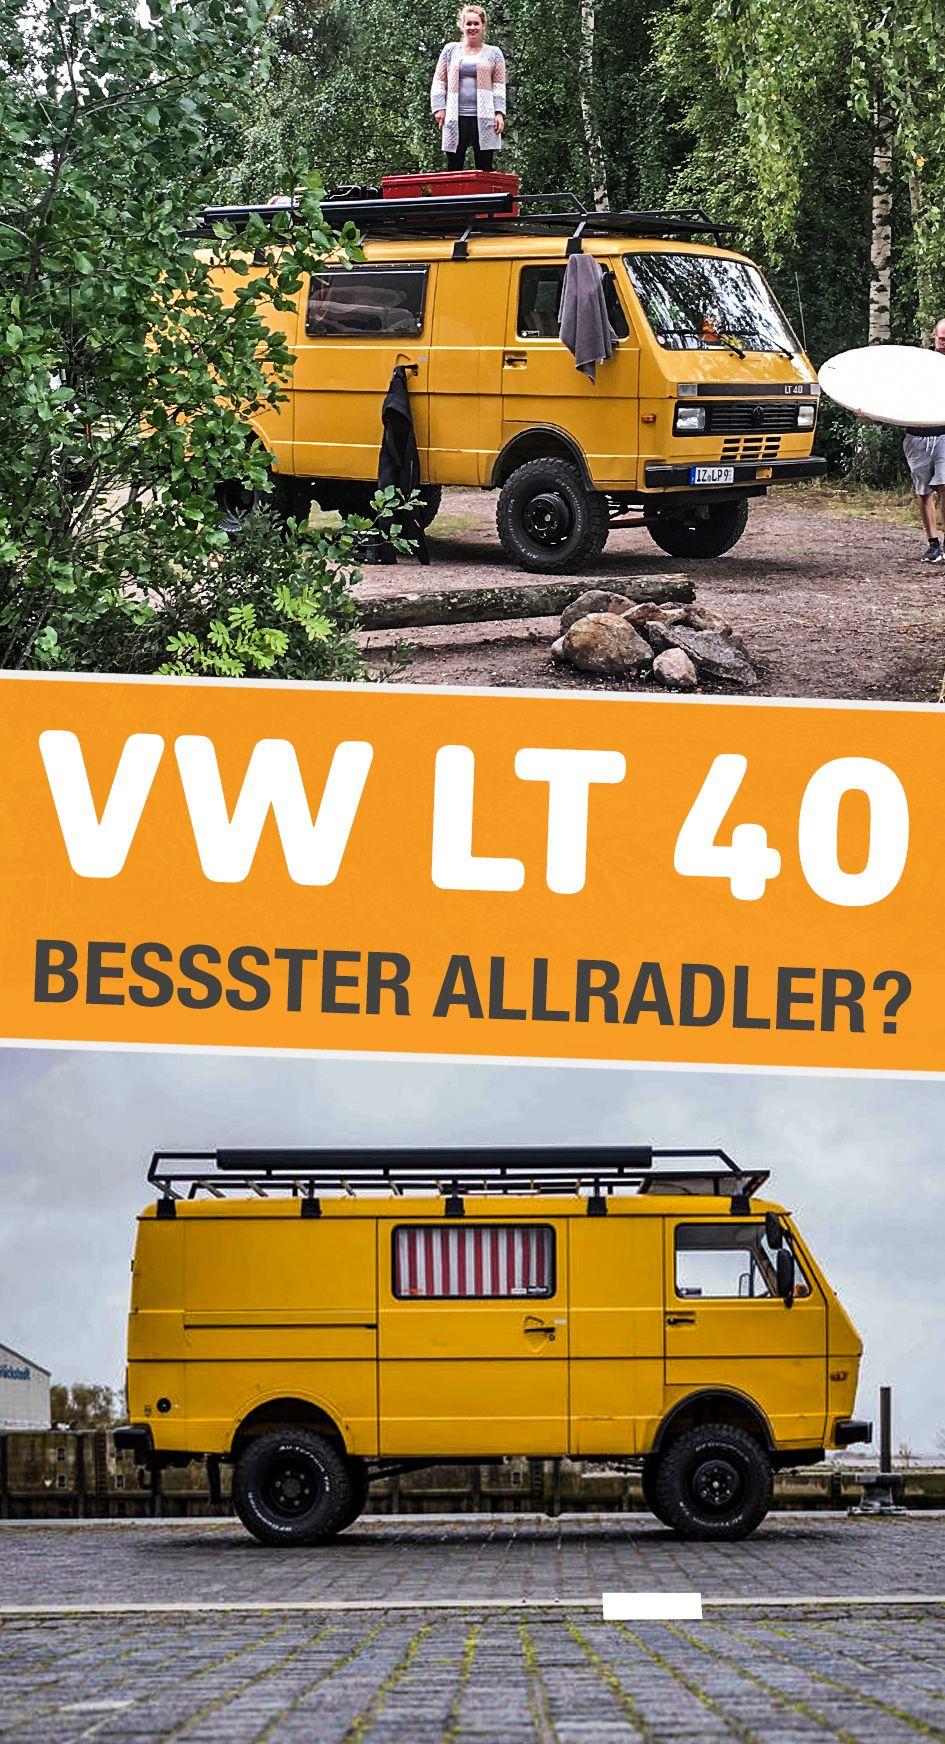 Vw Lt 40 Kein Allradfahrzeug Aber Viel Bodenfreiheit Vw Lt Vw Lt 4x4 Vw Lt 35